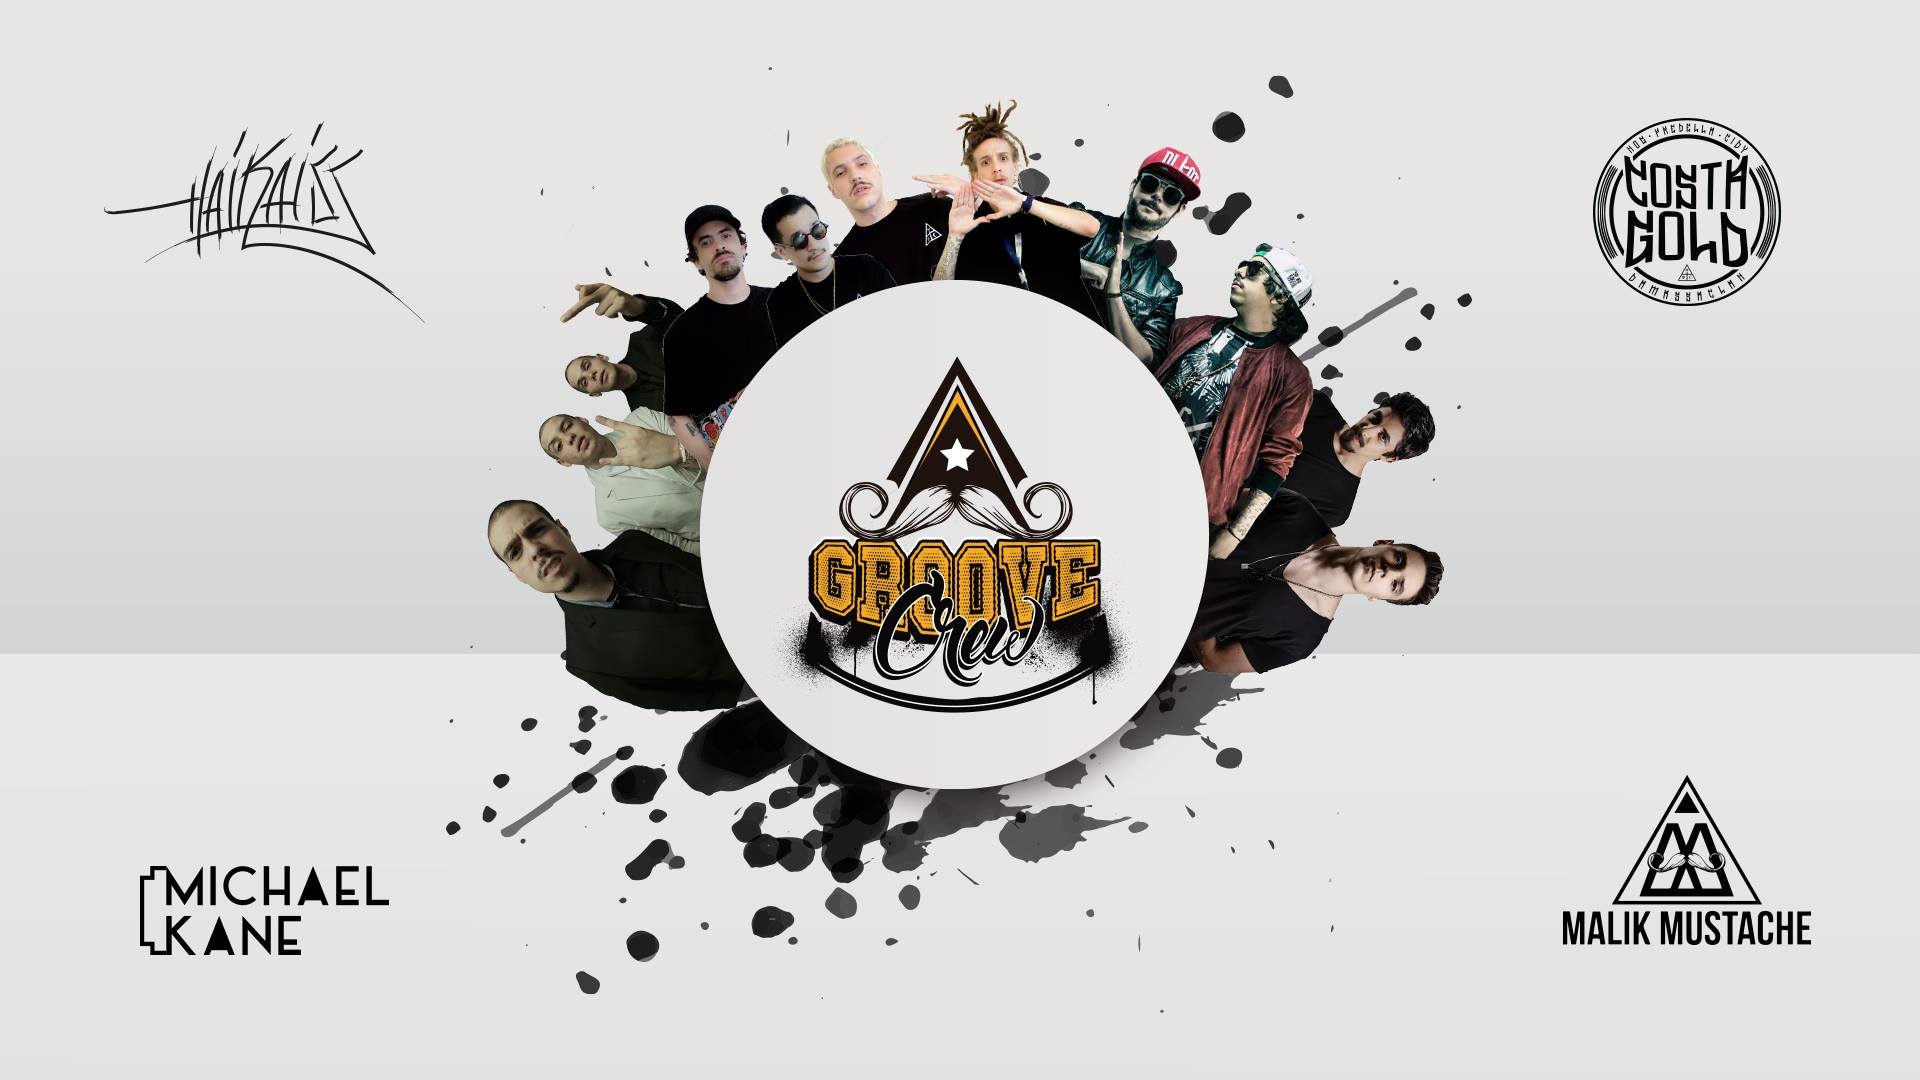 Groove Crew: Costa Gold, Haikaiss e Malik Mustache